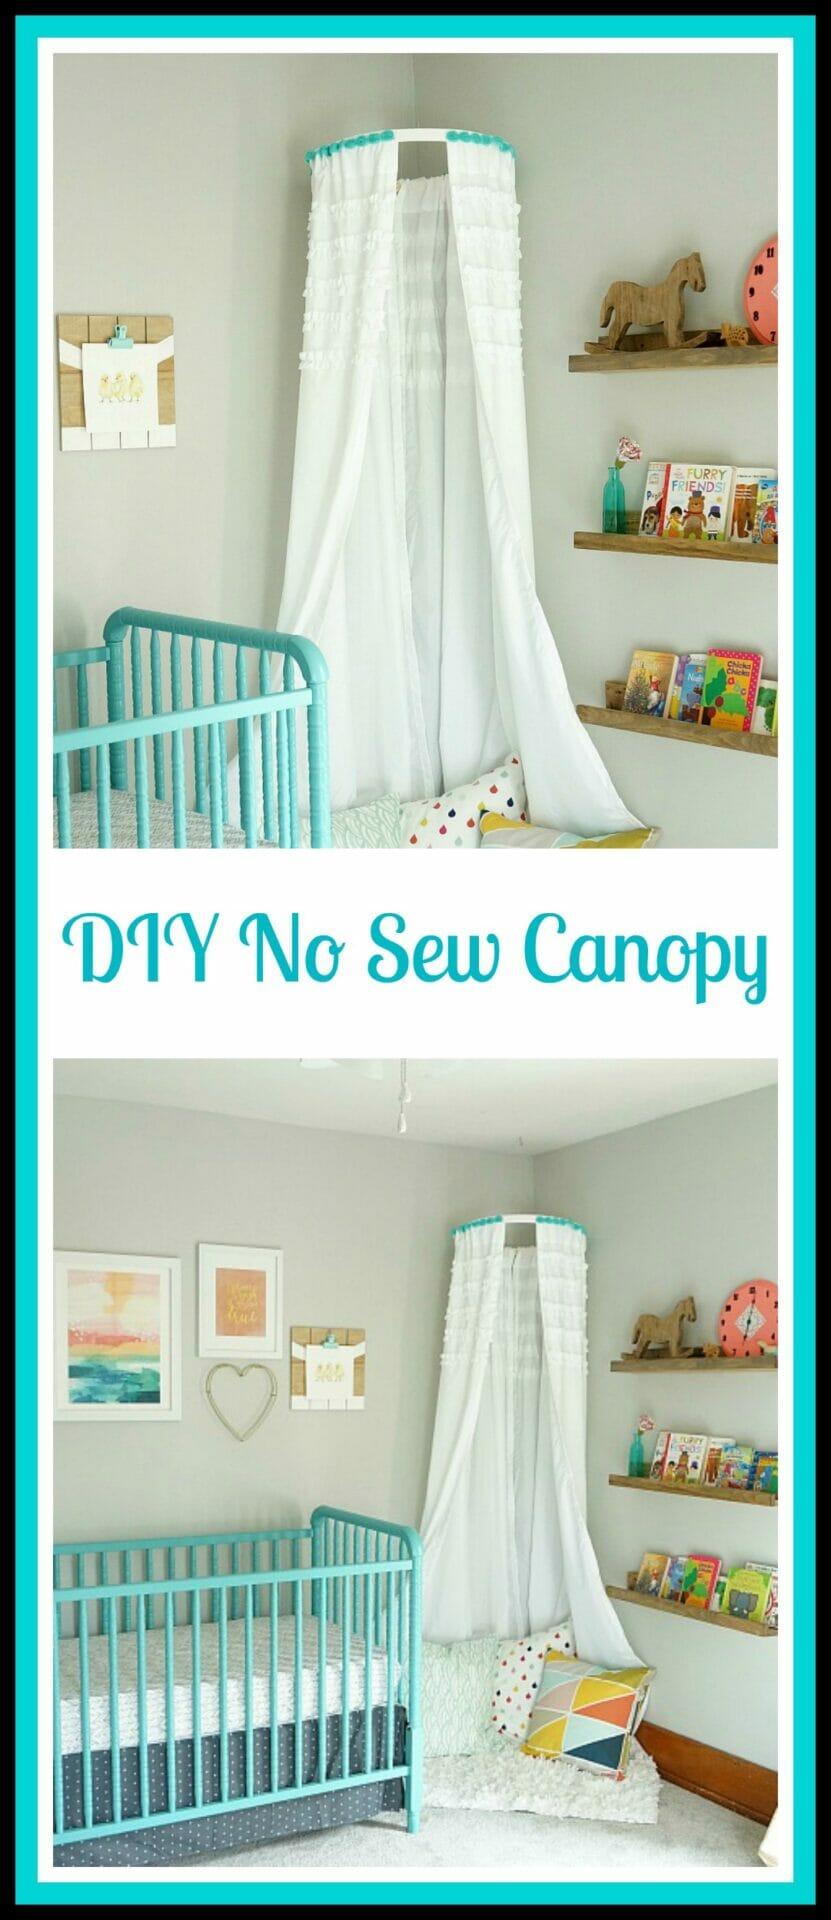 DIY No Sew Children's Canopy